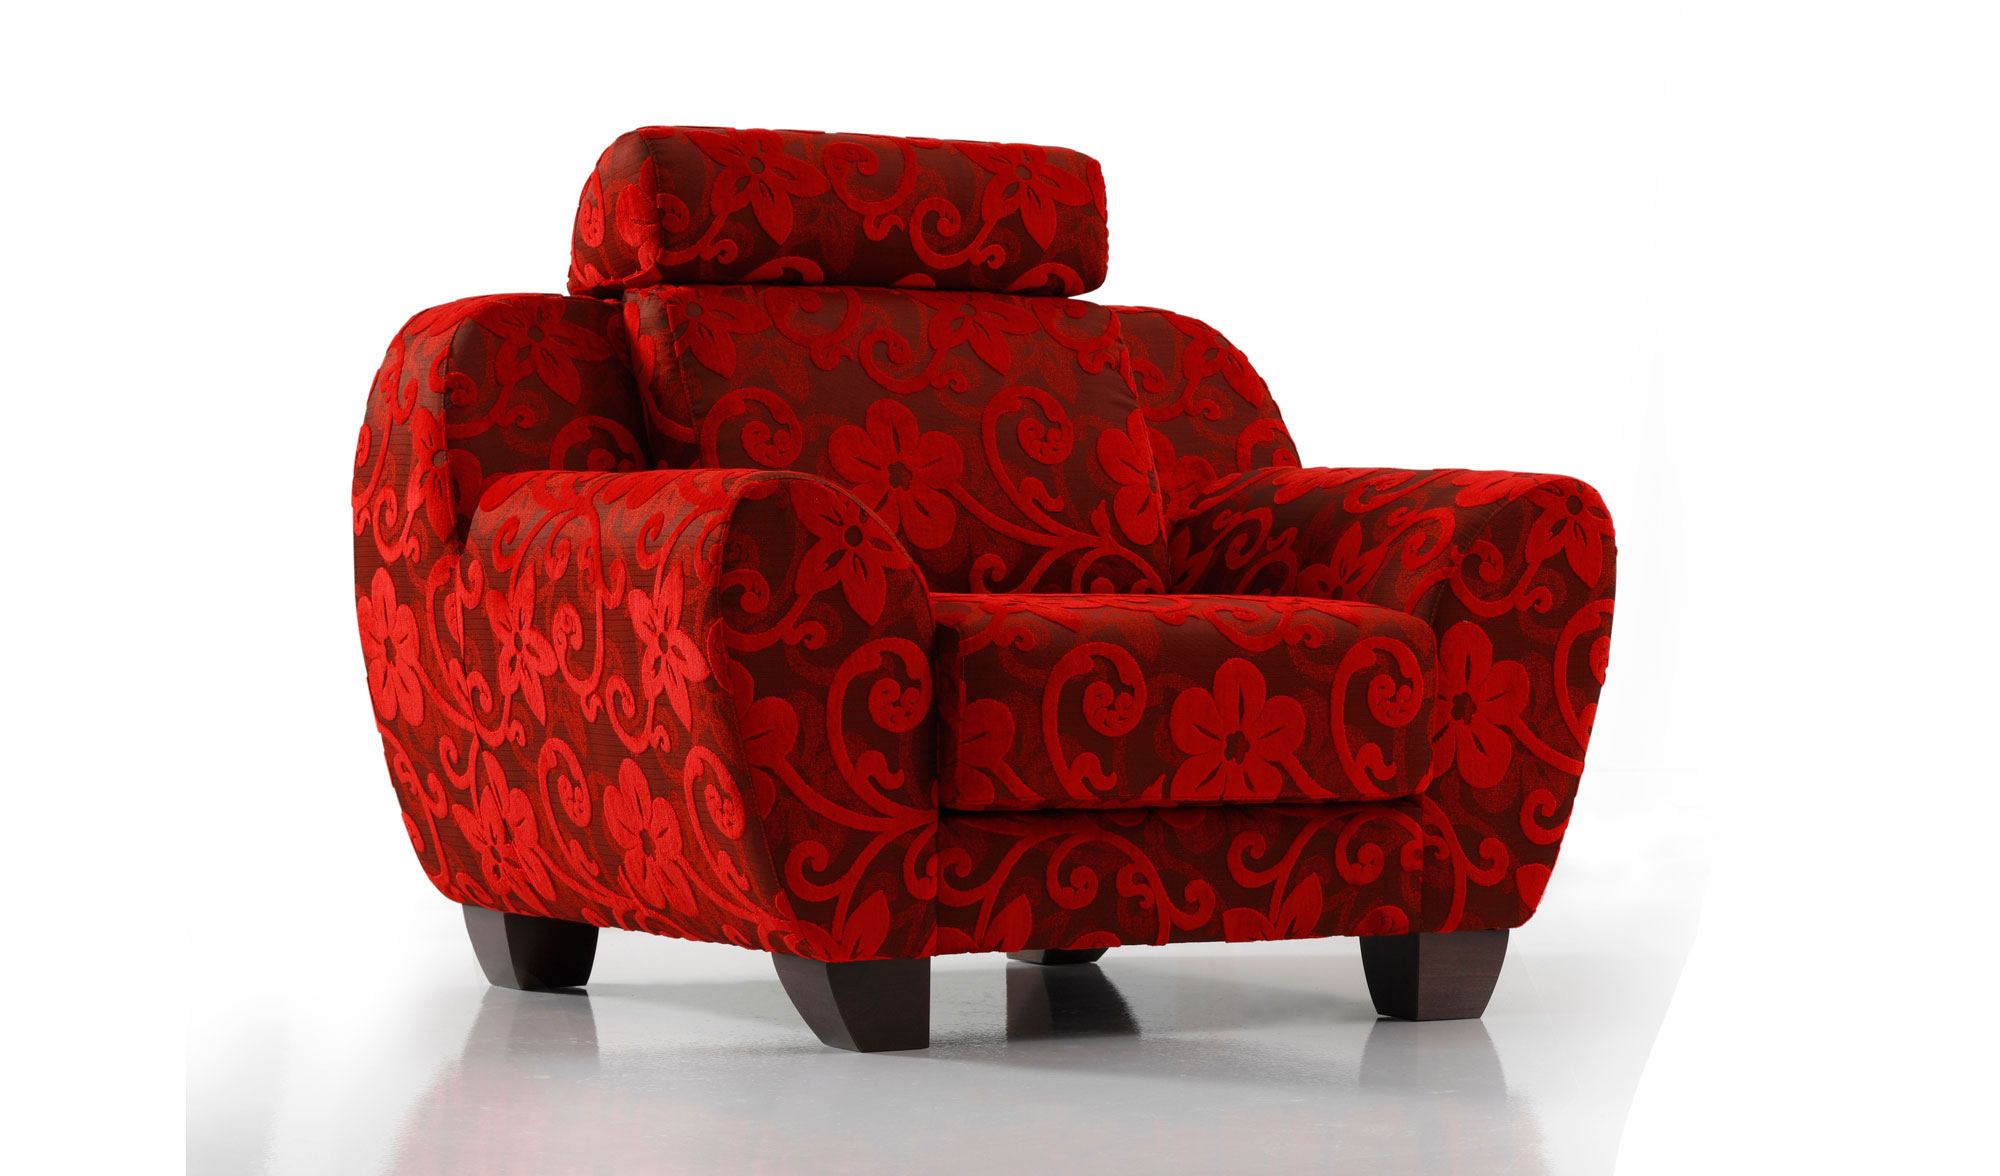 Butaca Moderna Gente En Portobellostreet Es # Muebles Butacas Modernas